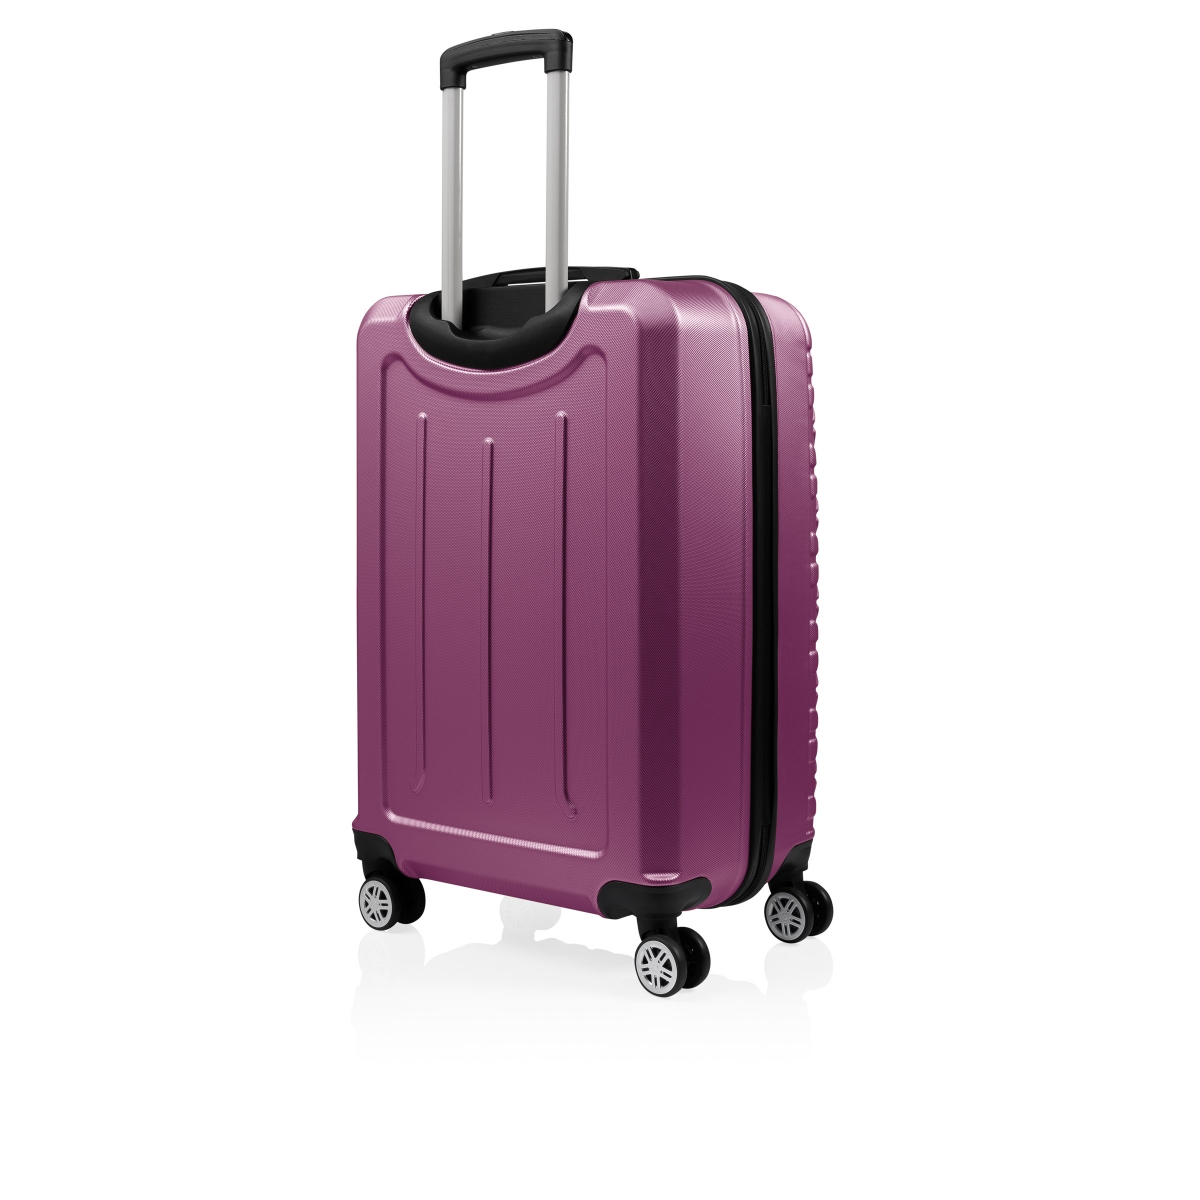 Gedox Abs 3'lü Valiz Seyahat Seti - Model:800.09 Mürdüm